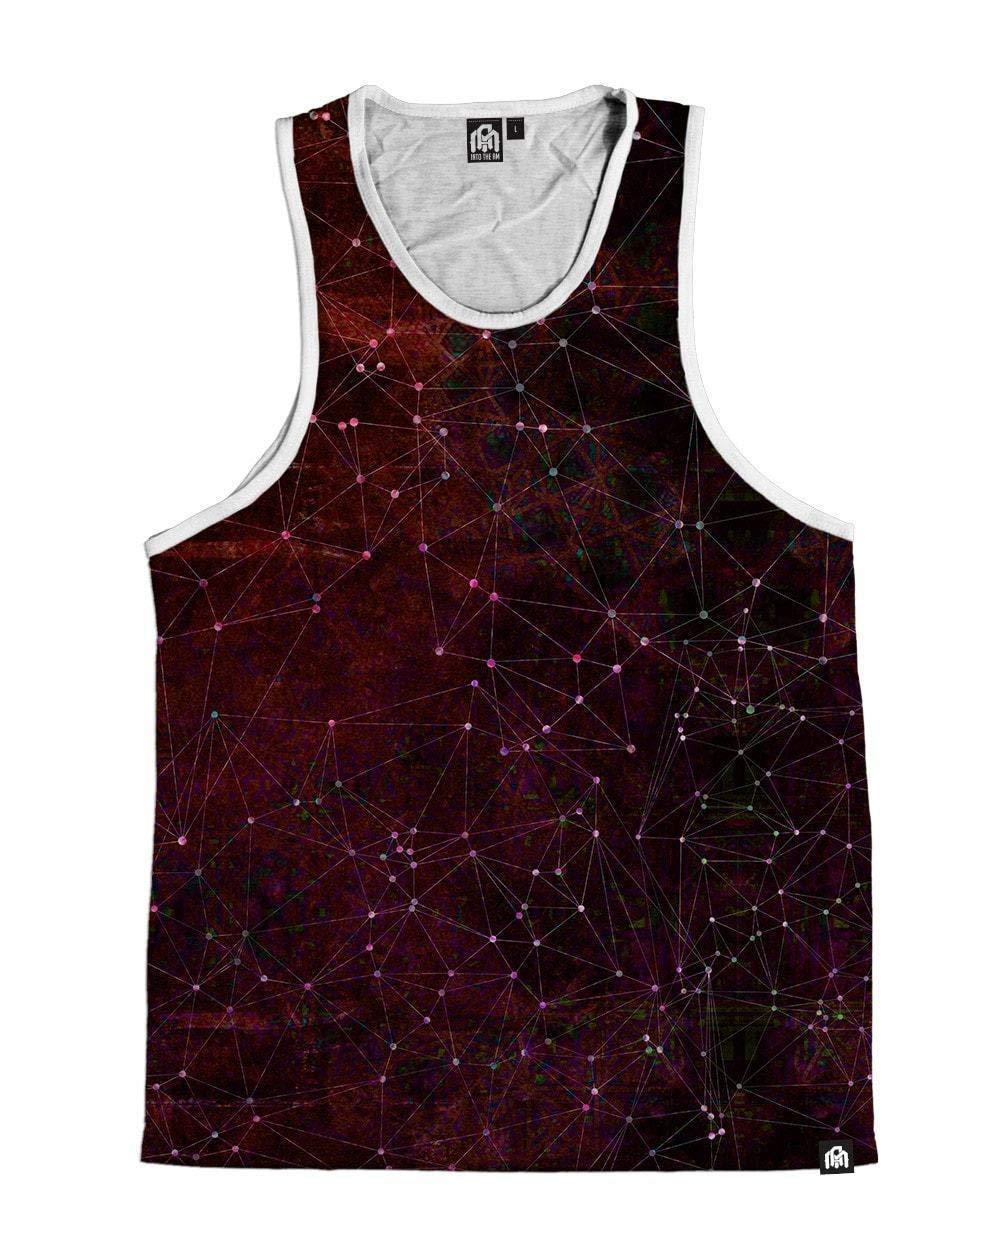 INTO THE AM Zodiac Men's Sleeveless Tank Top Shirt - Red (X-Large)